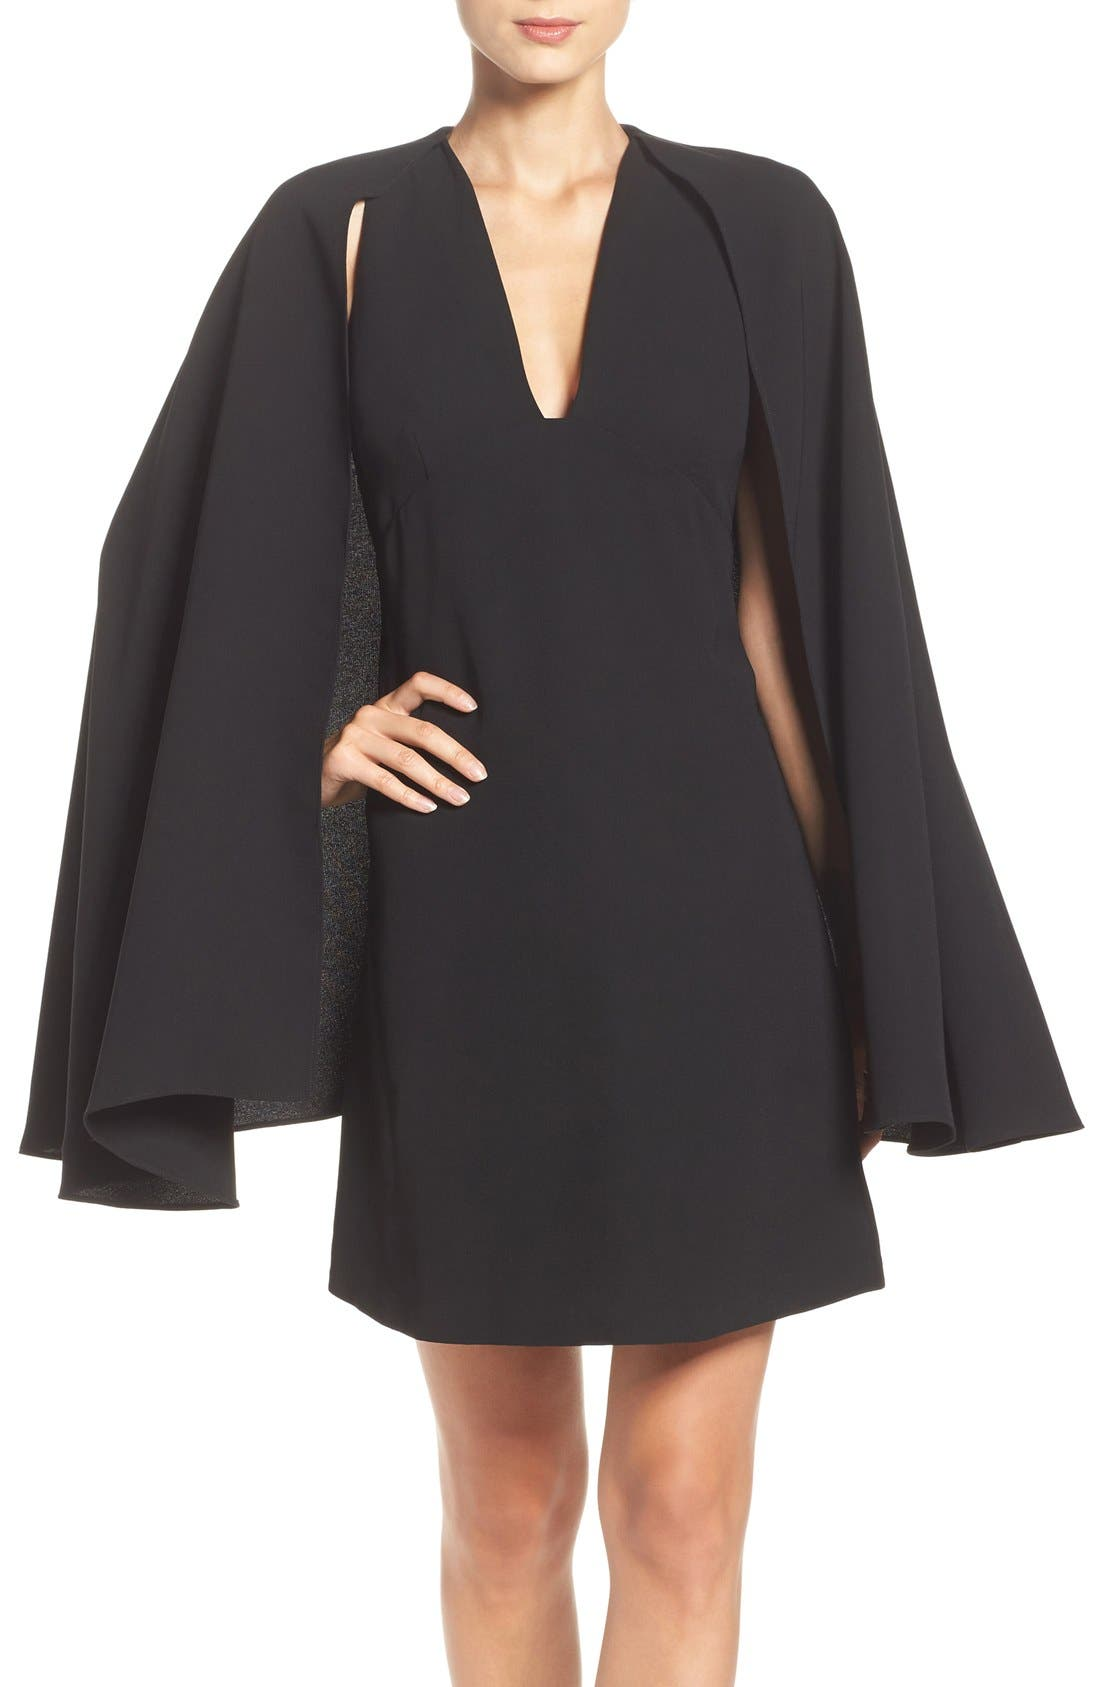 Alternate Image 1 Selected - Olivia Palermo + Chelsea28 Cape Dress